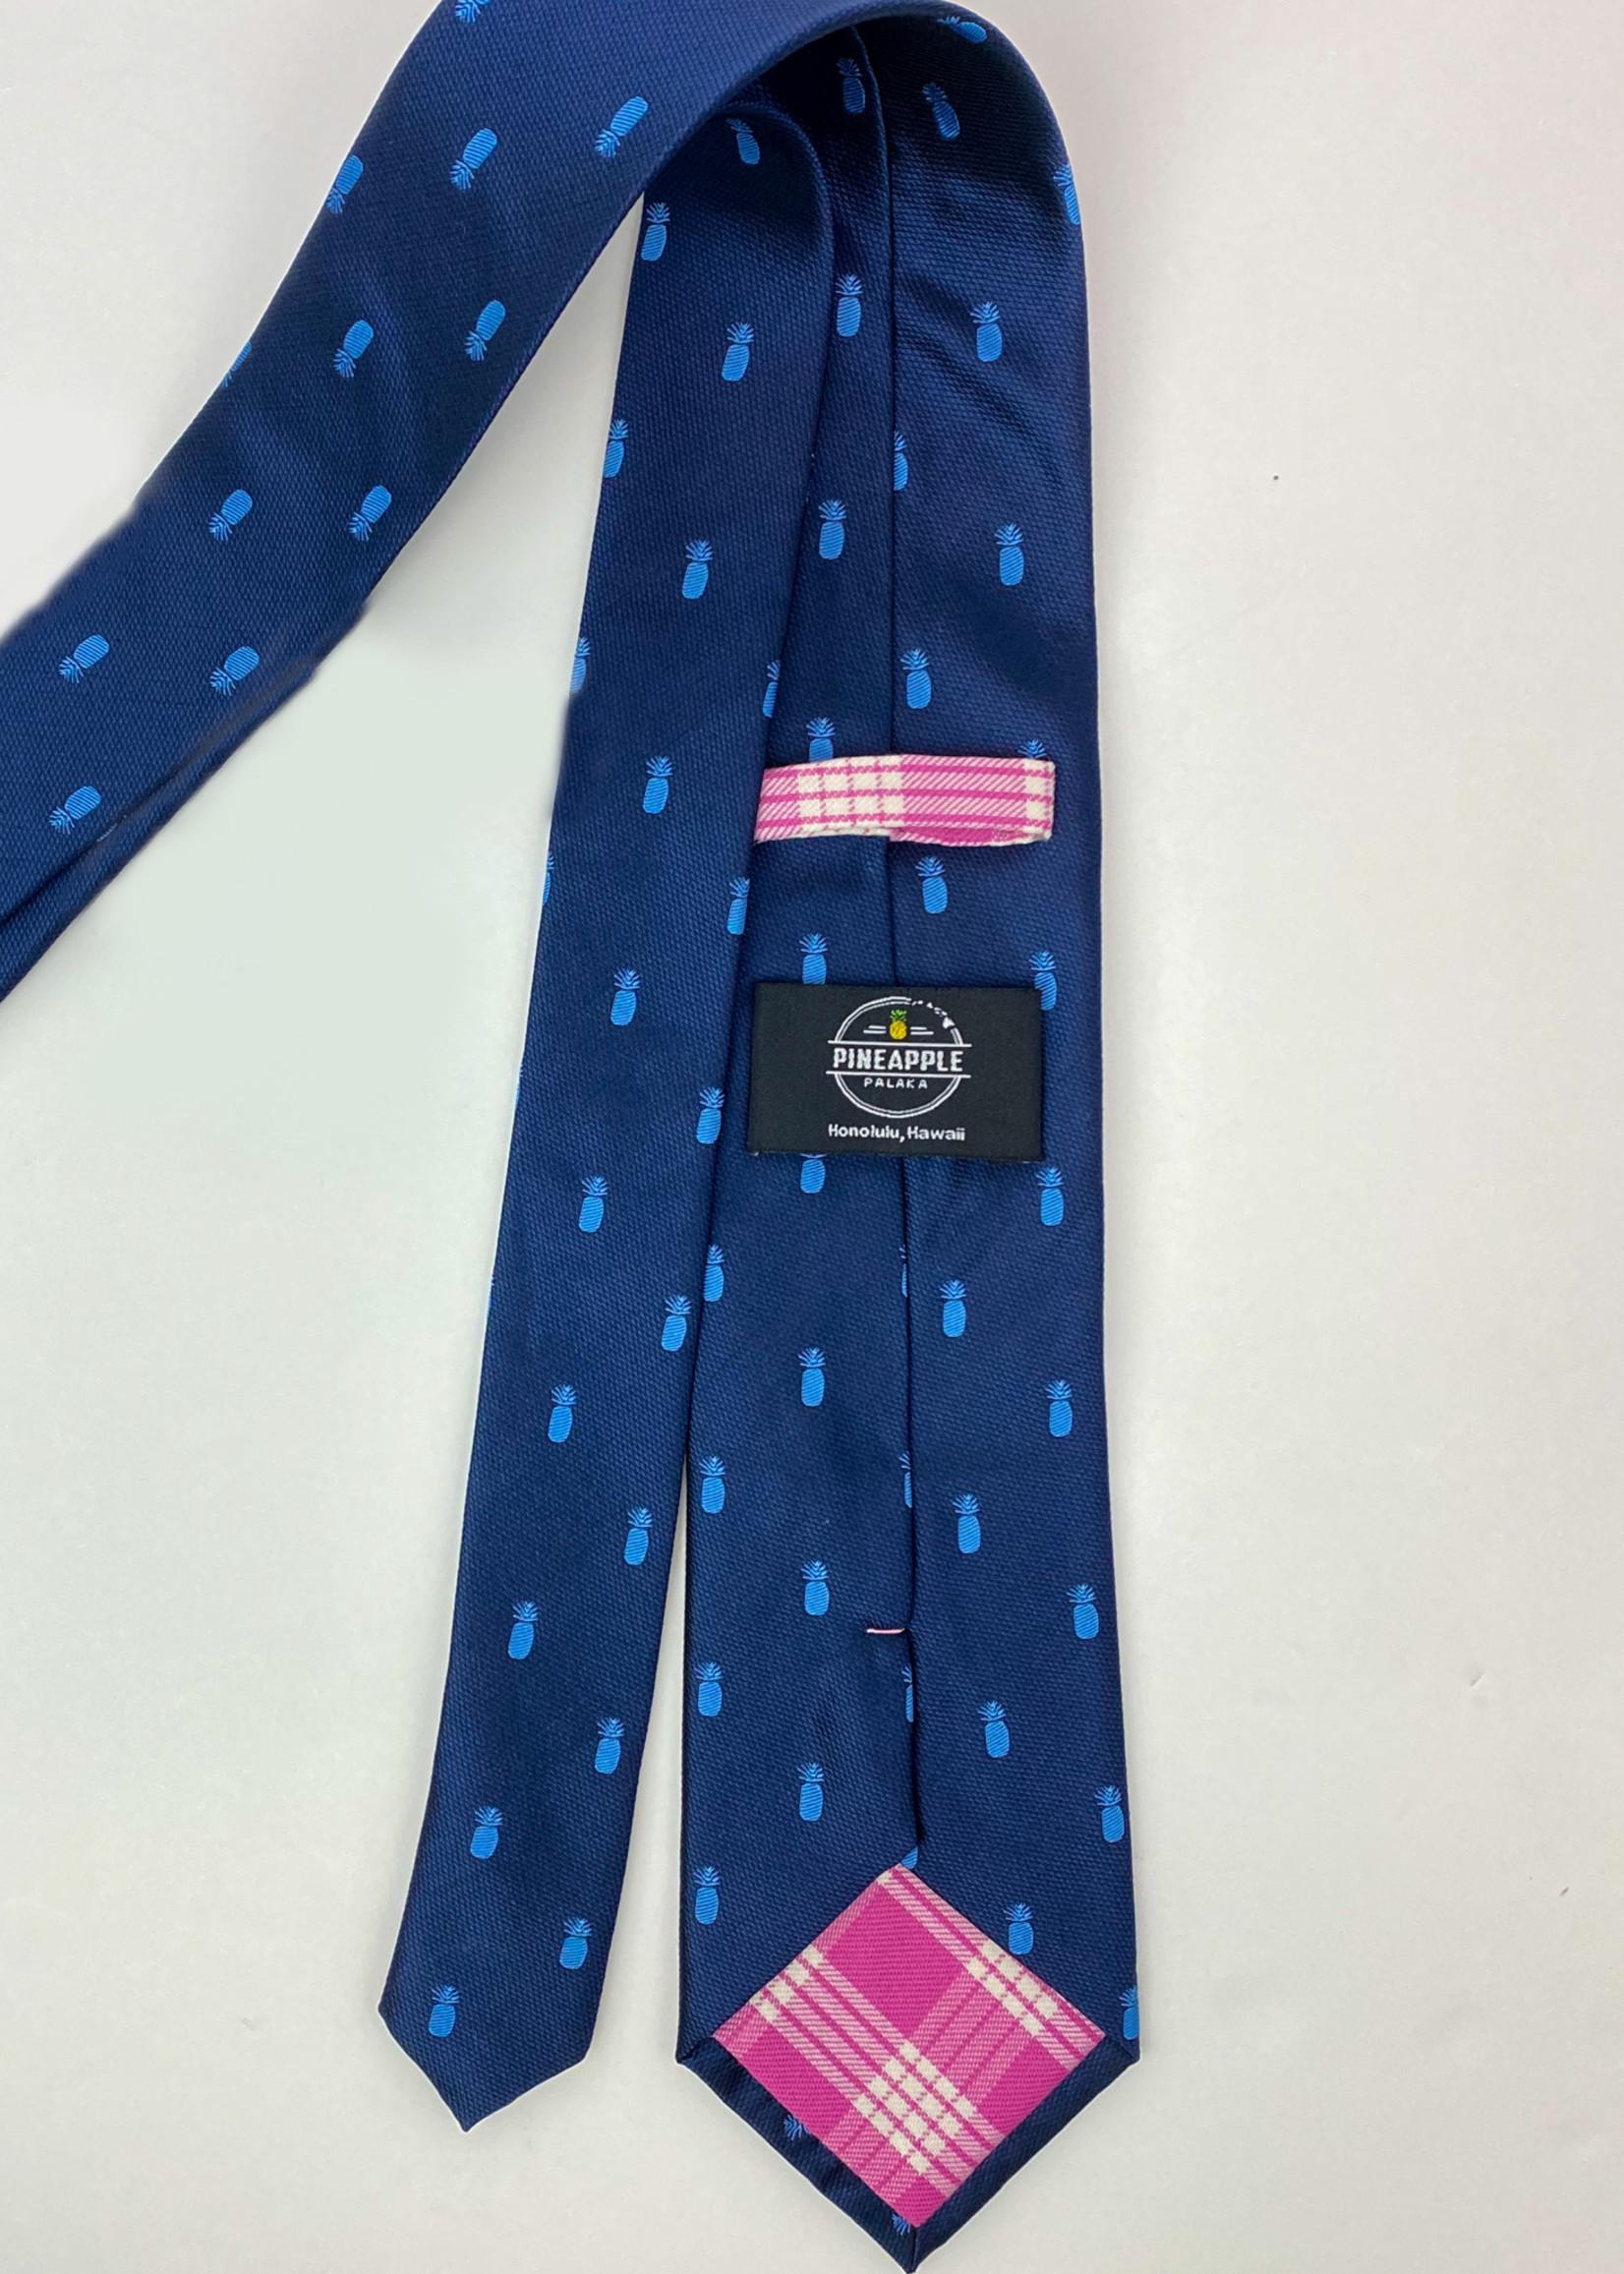 Pineapple Palaka Pineapple Palaka Ties -  Pineapple Vice Navy/Light Blue Modern Necktie